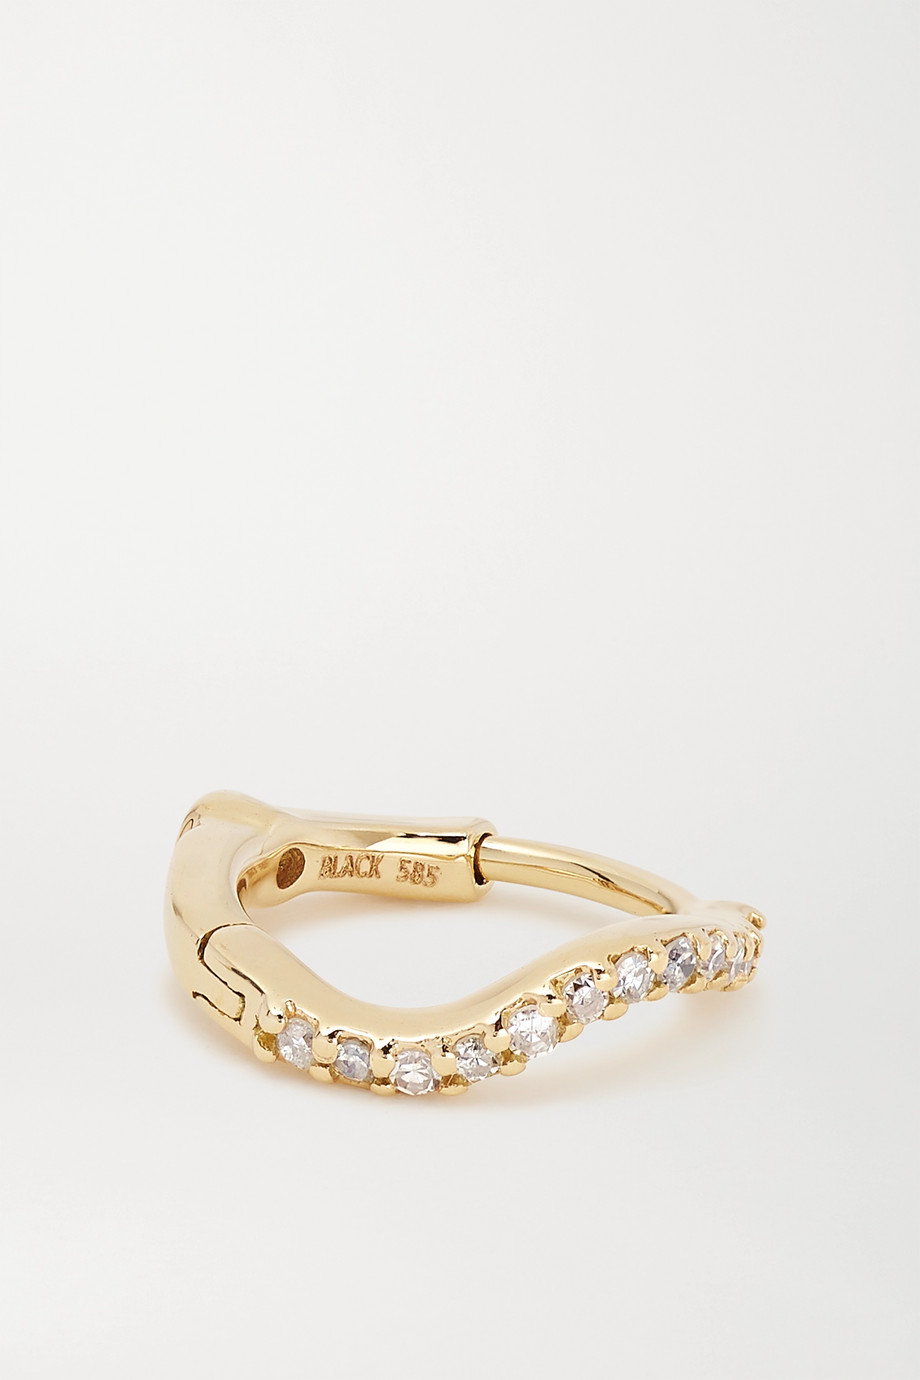 Maria Black Wave Huggie gold, diamond and sapphire earring